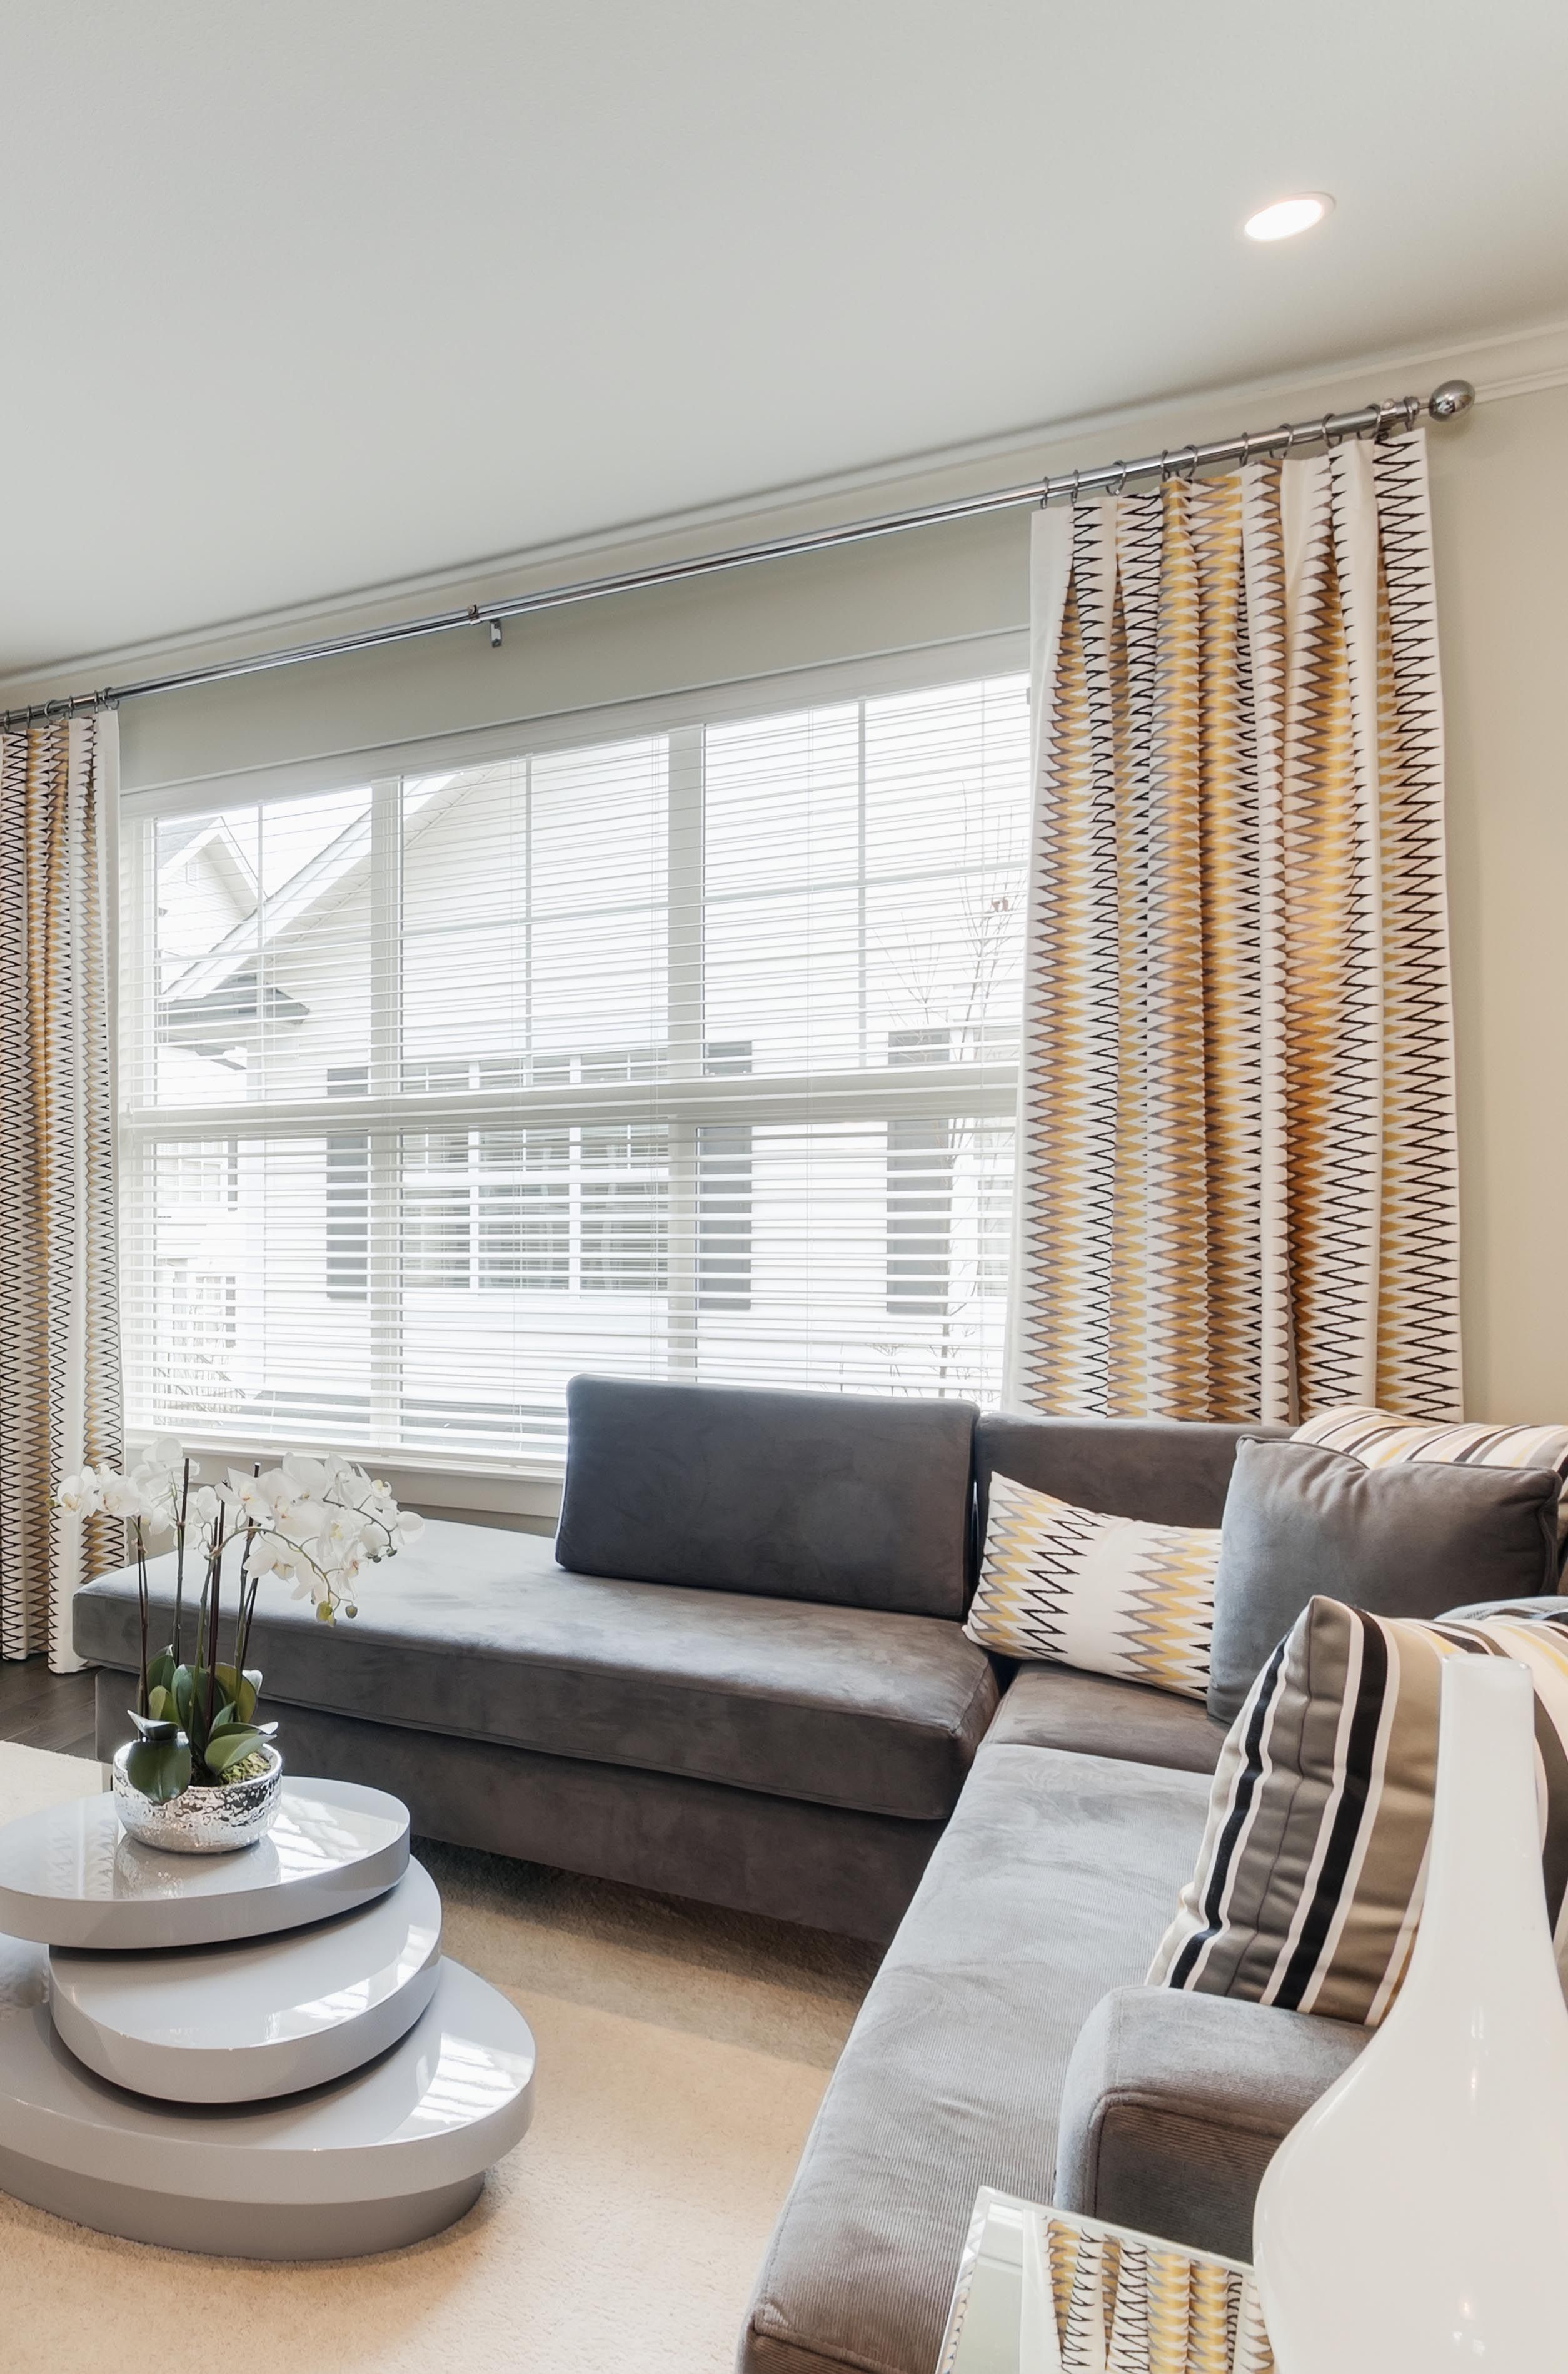 Interior Designer Window Tricks - How to Make Windows Look Bigger